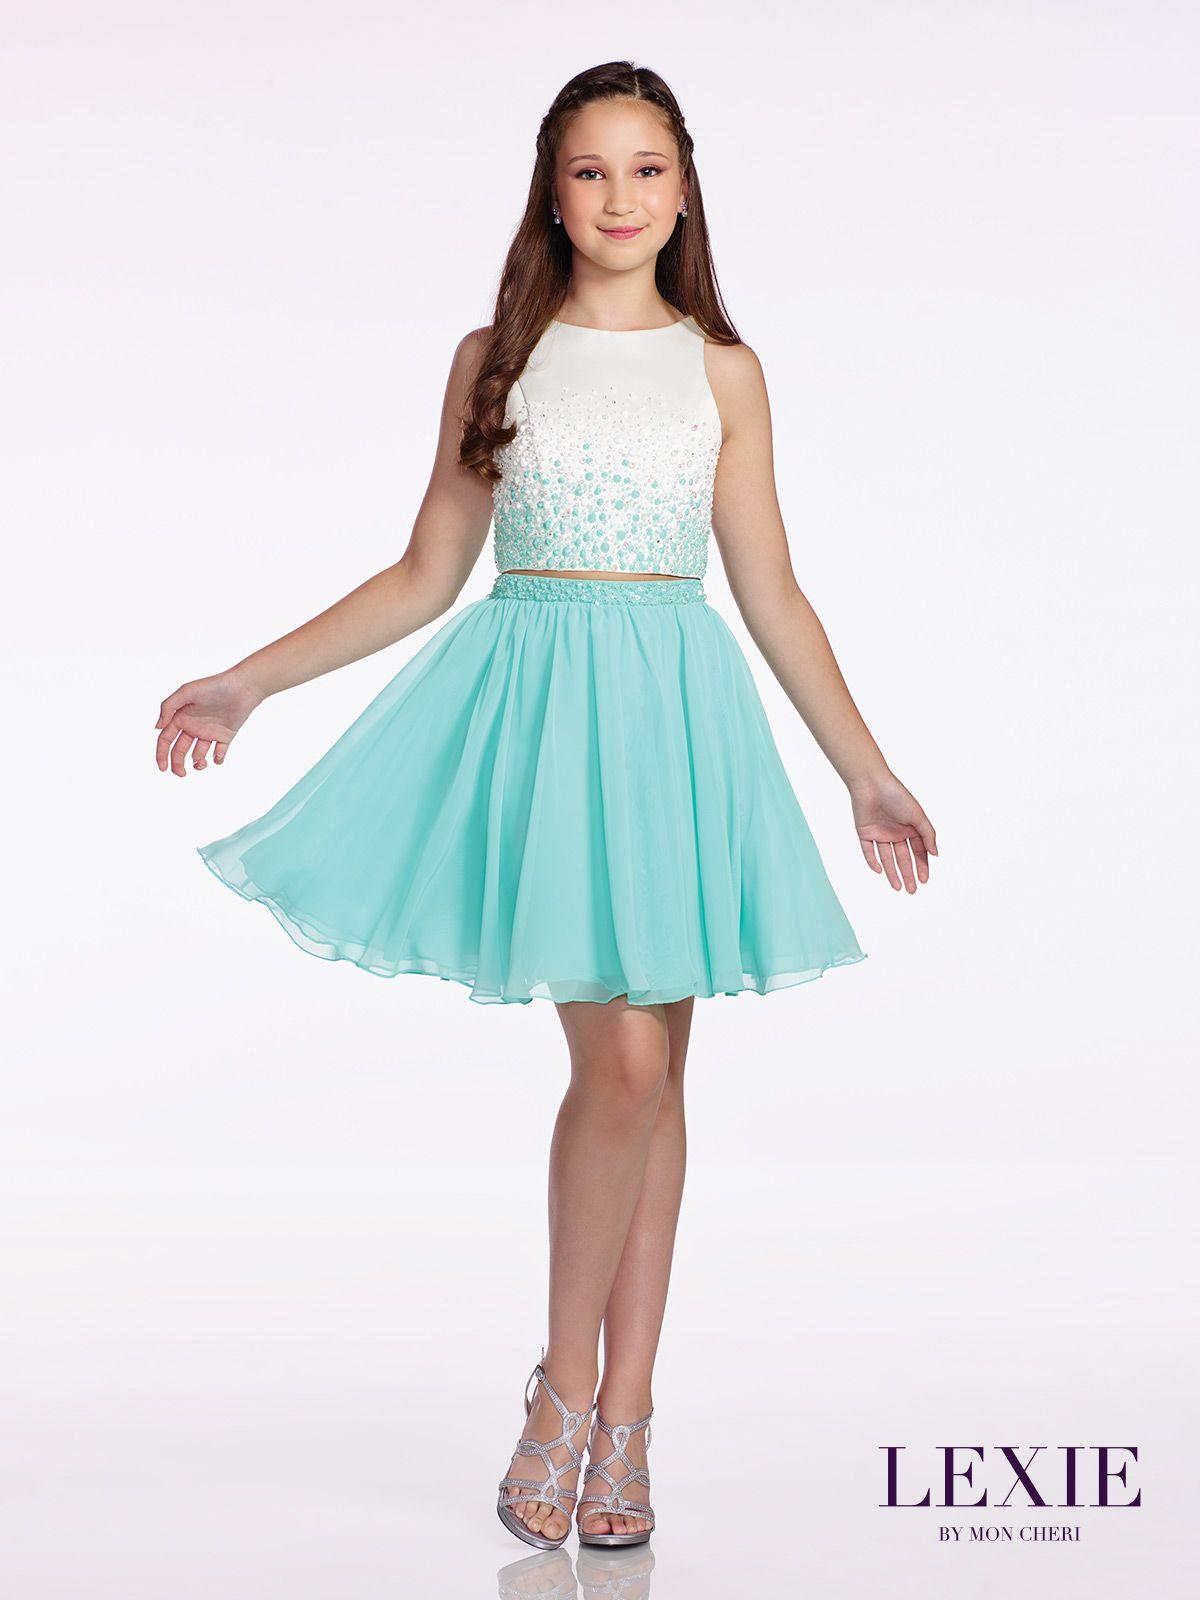 TW11663 | Full circle skirts, Circle skirts and Chiffon dress